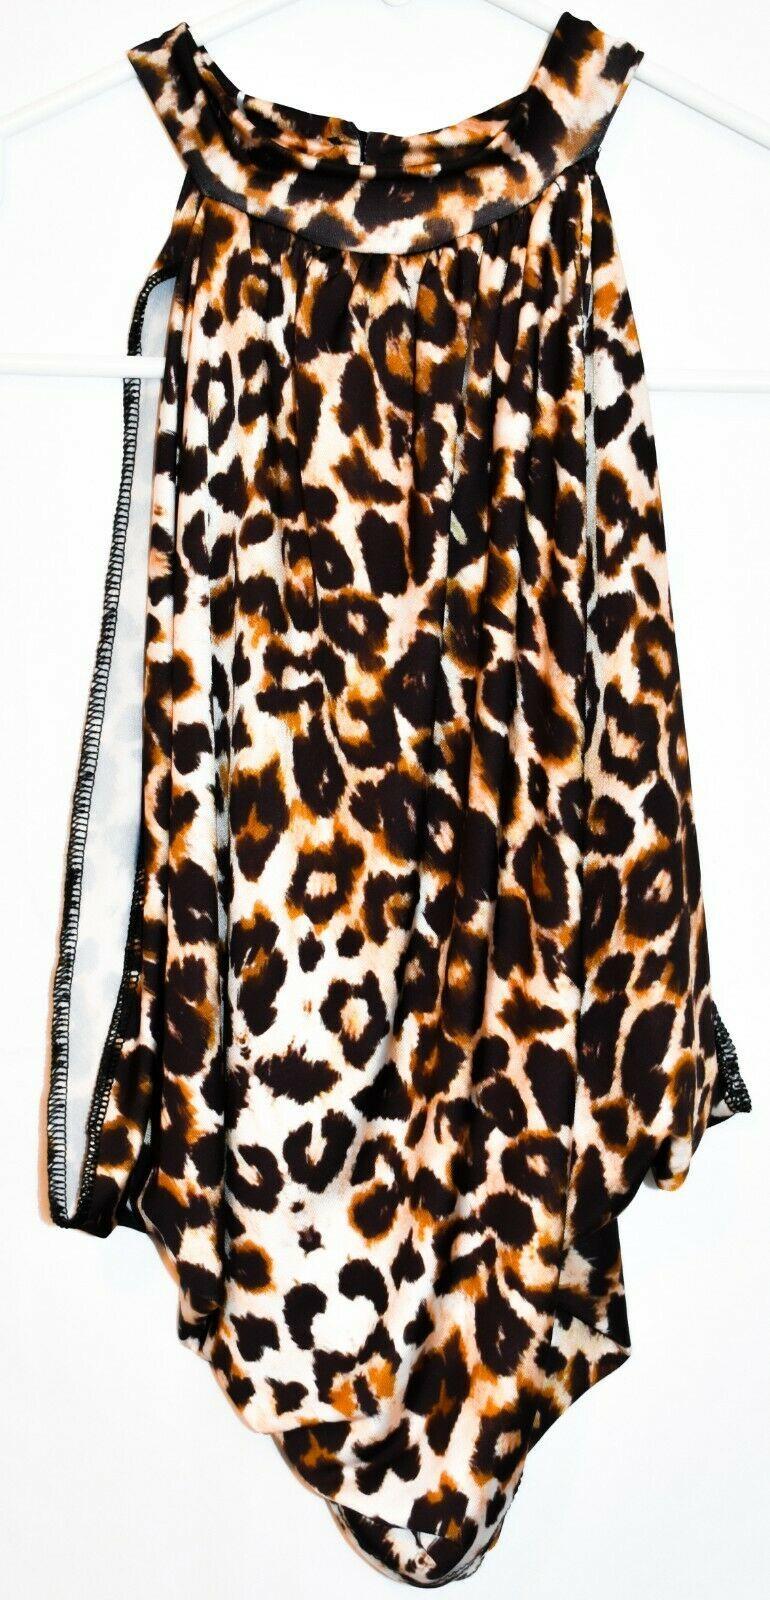 Pretty Little Thing Women's Leopard Animal Print Open Neck Wrap Crop Top Size 4